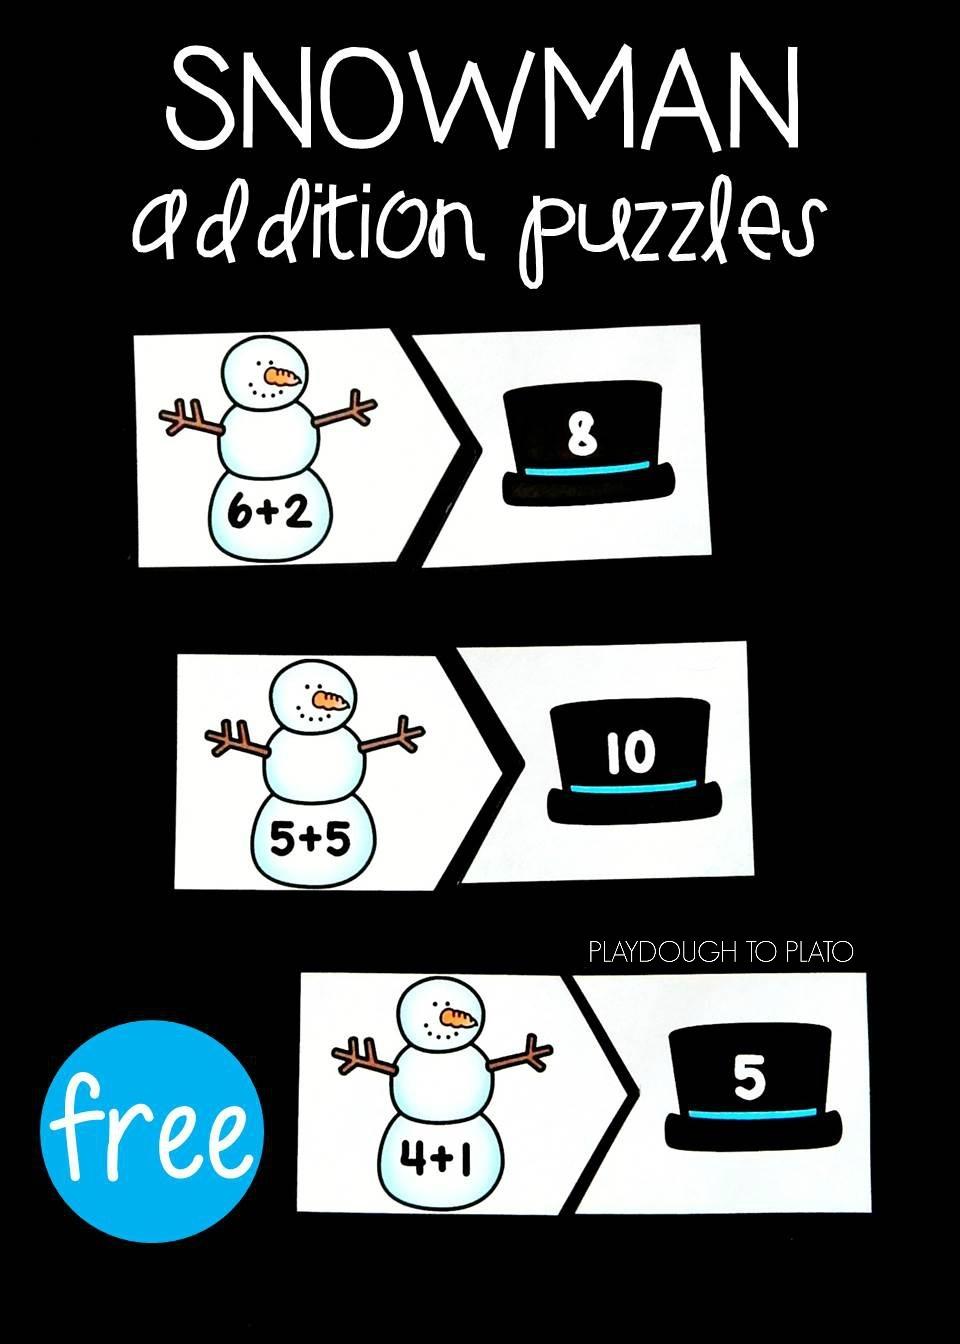 Snowman Addition Puzzles